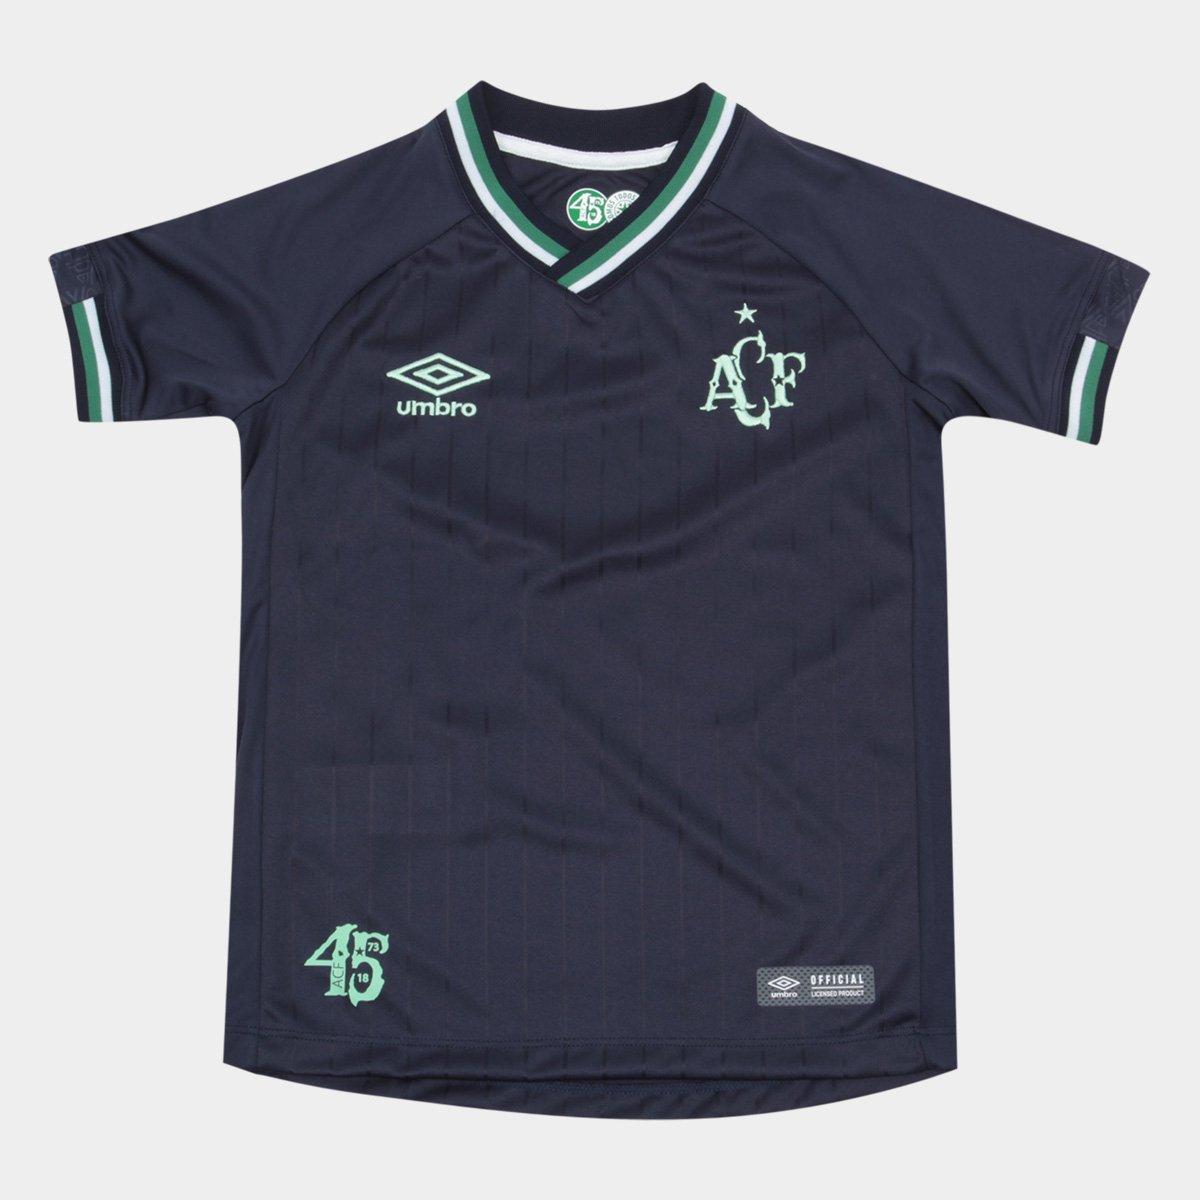 c6b0d9bb6c706 Camisa Chapecoense Infantil III 2018 s/n° Torcedor Umbro - Marinho e Verde  | Loja da Chape